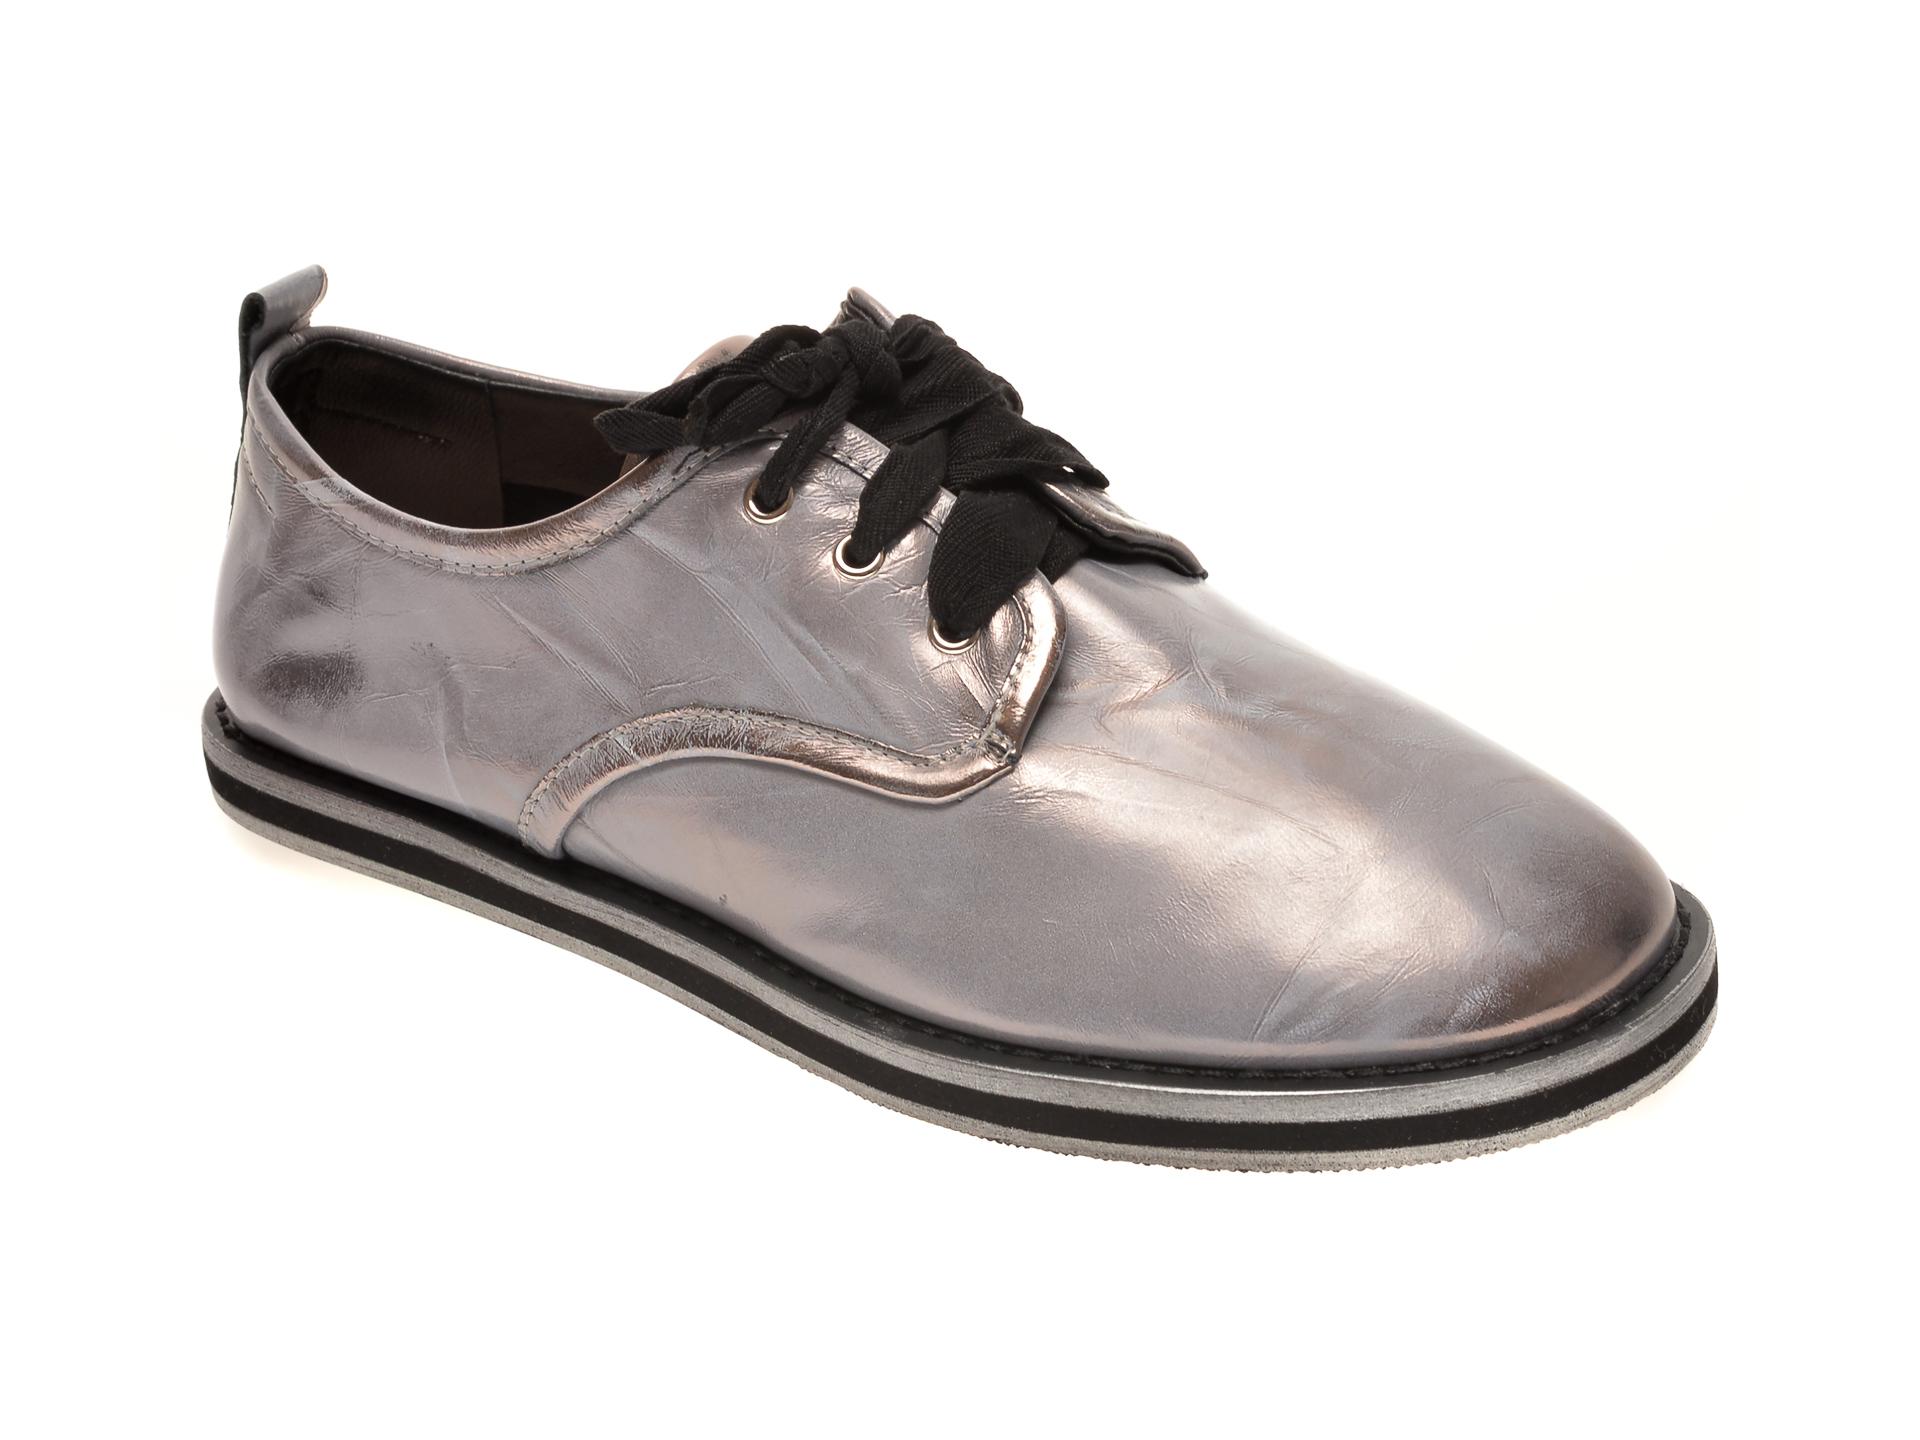 Pantofi EPICA gri, AH025M1, din piele naturala imagine